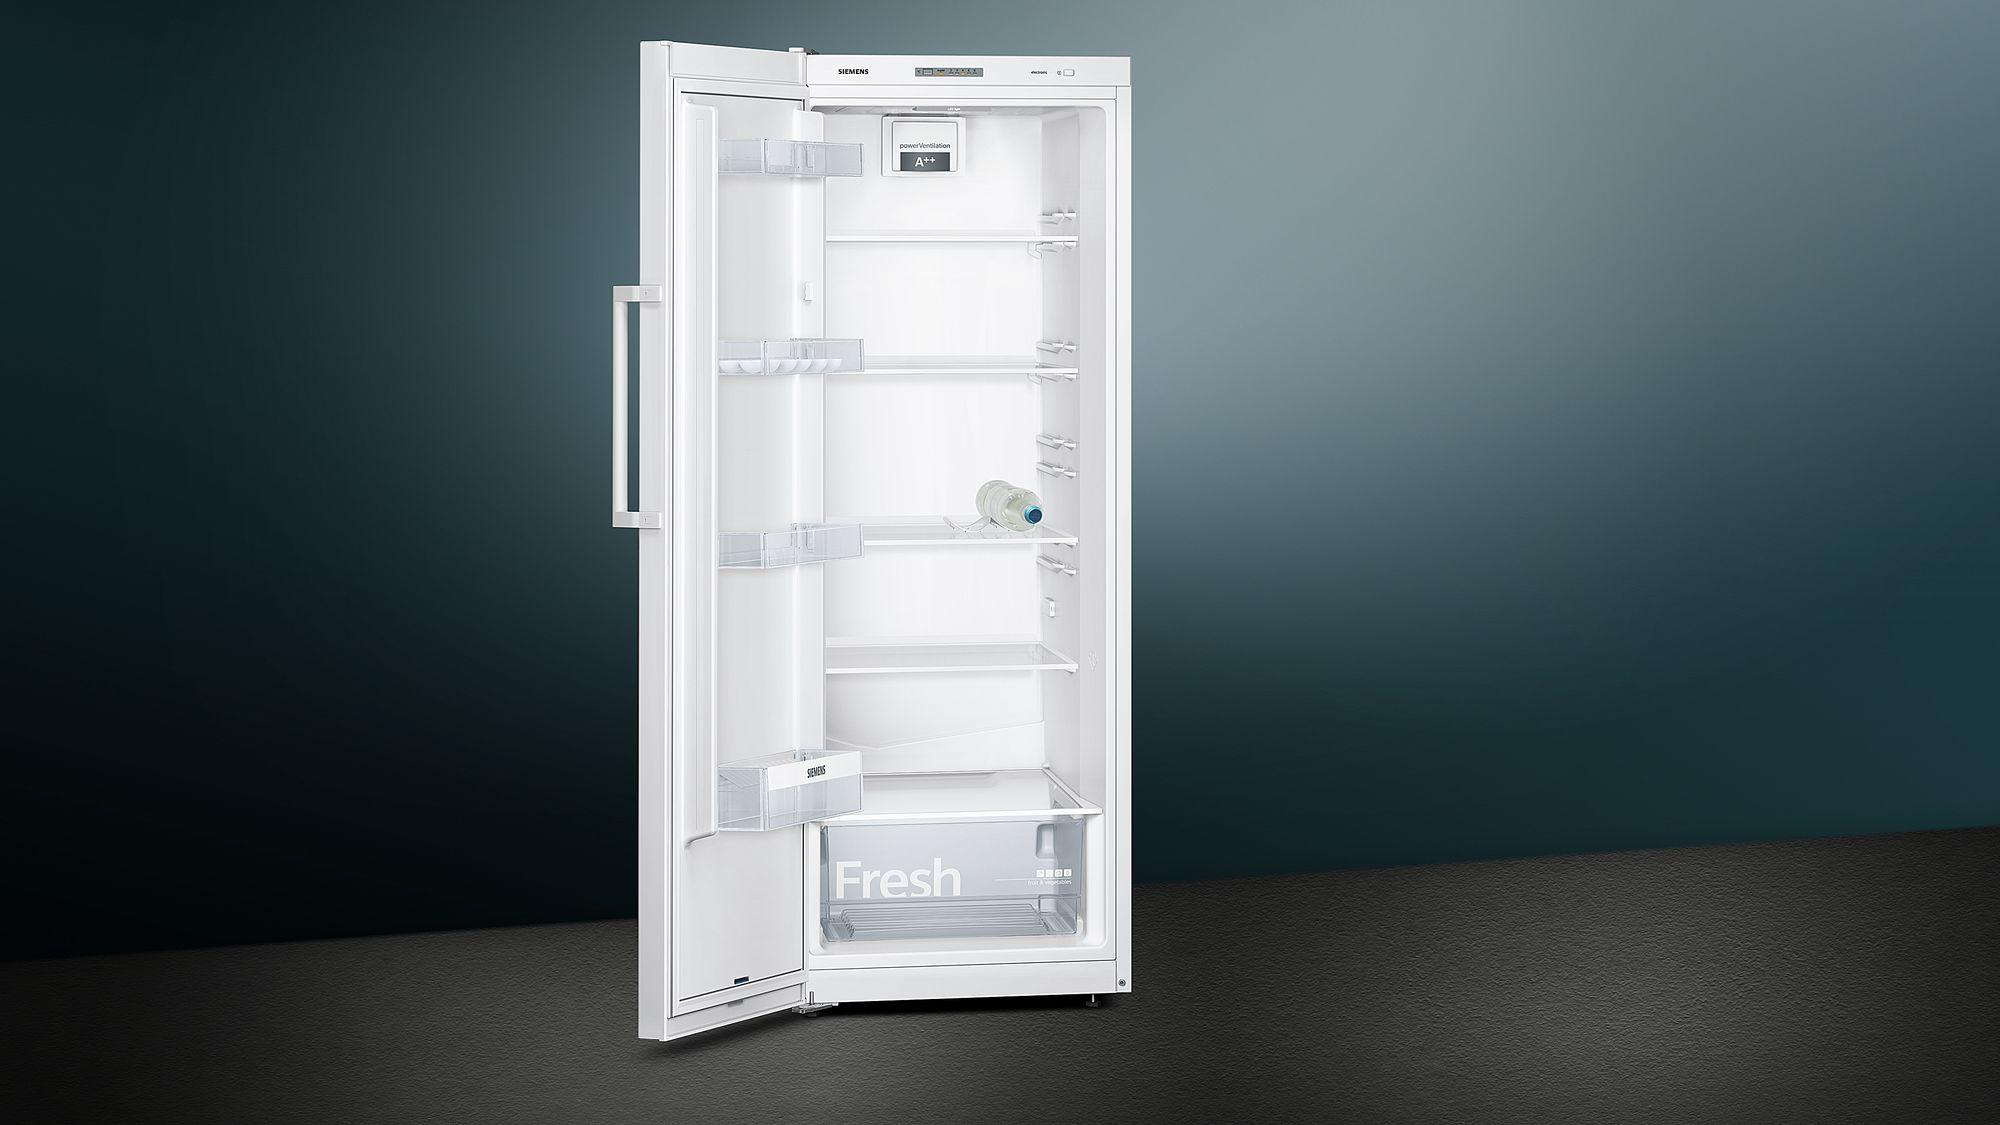 Siemens Kühlschrank Groß : Siemens kühlschrank weis iq ks vnw p preisflix